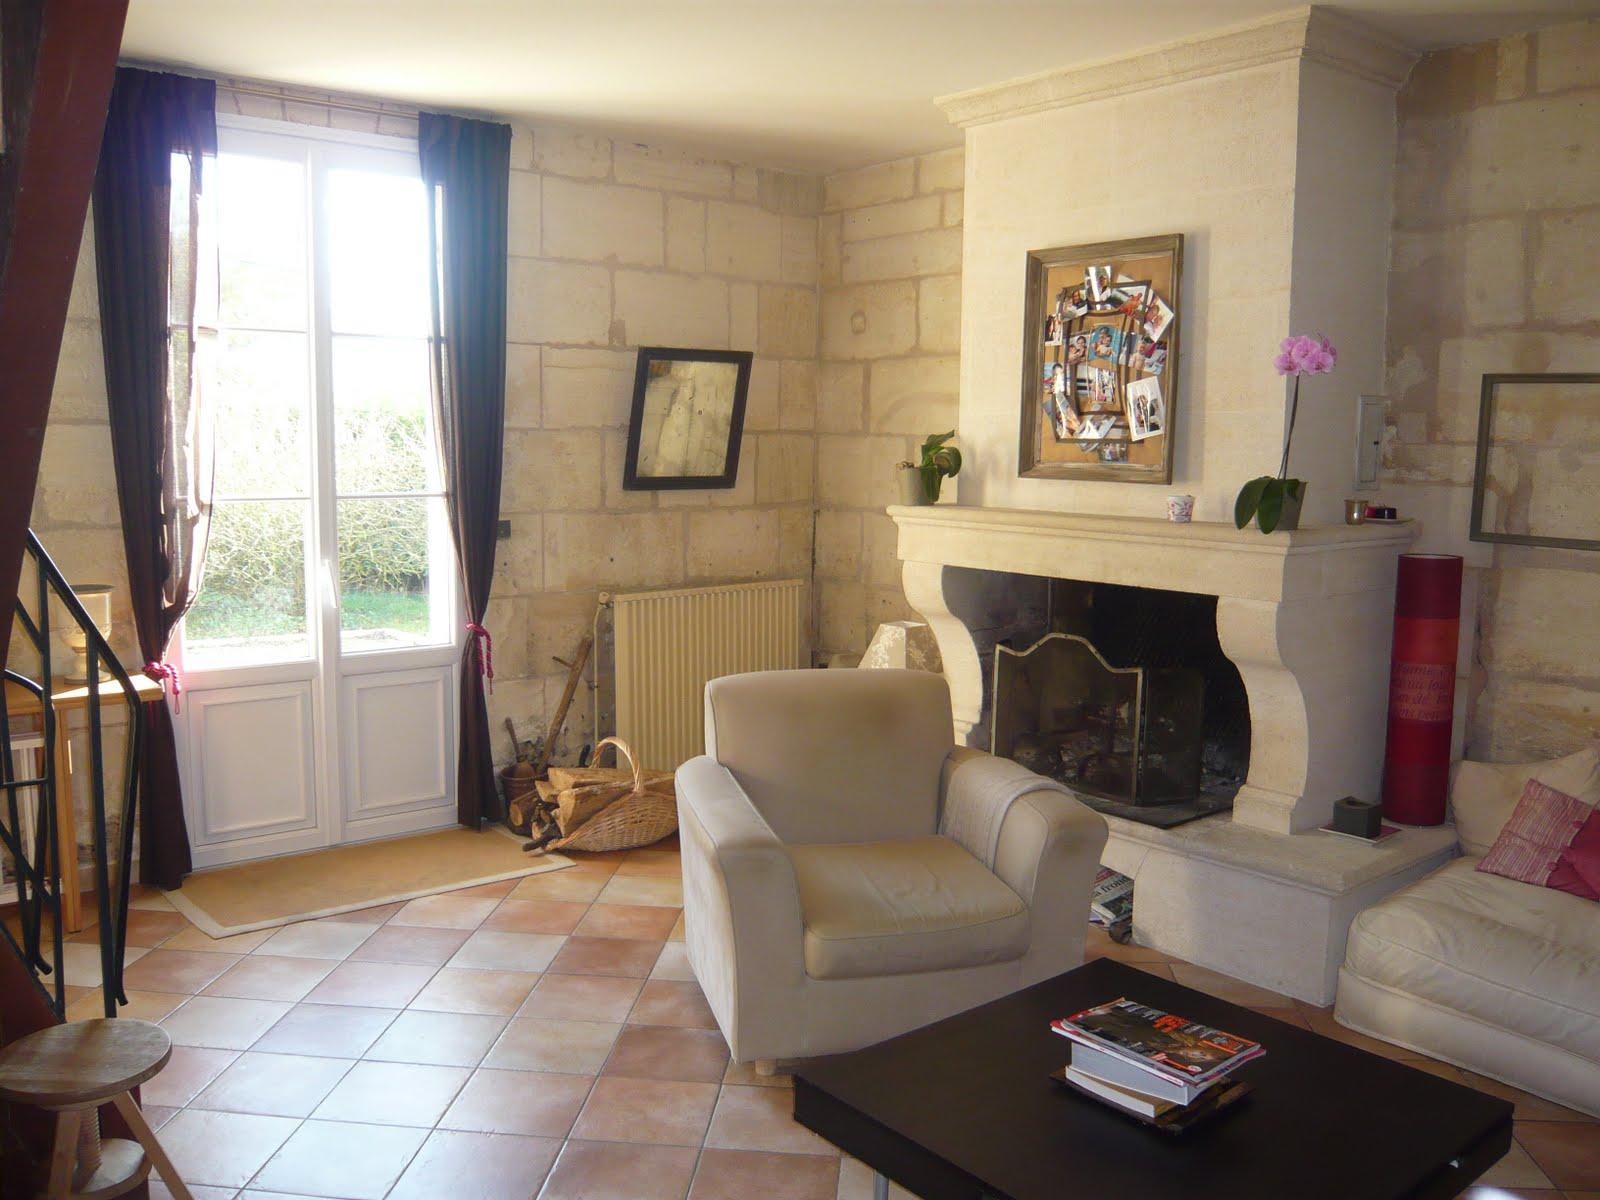 maison vendre salleboeuf salon 25m2 rdc. Black Bedroom Furniture Sets. Home Design Ideas